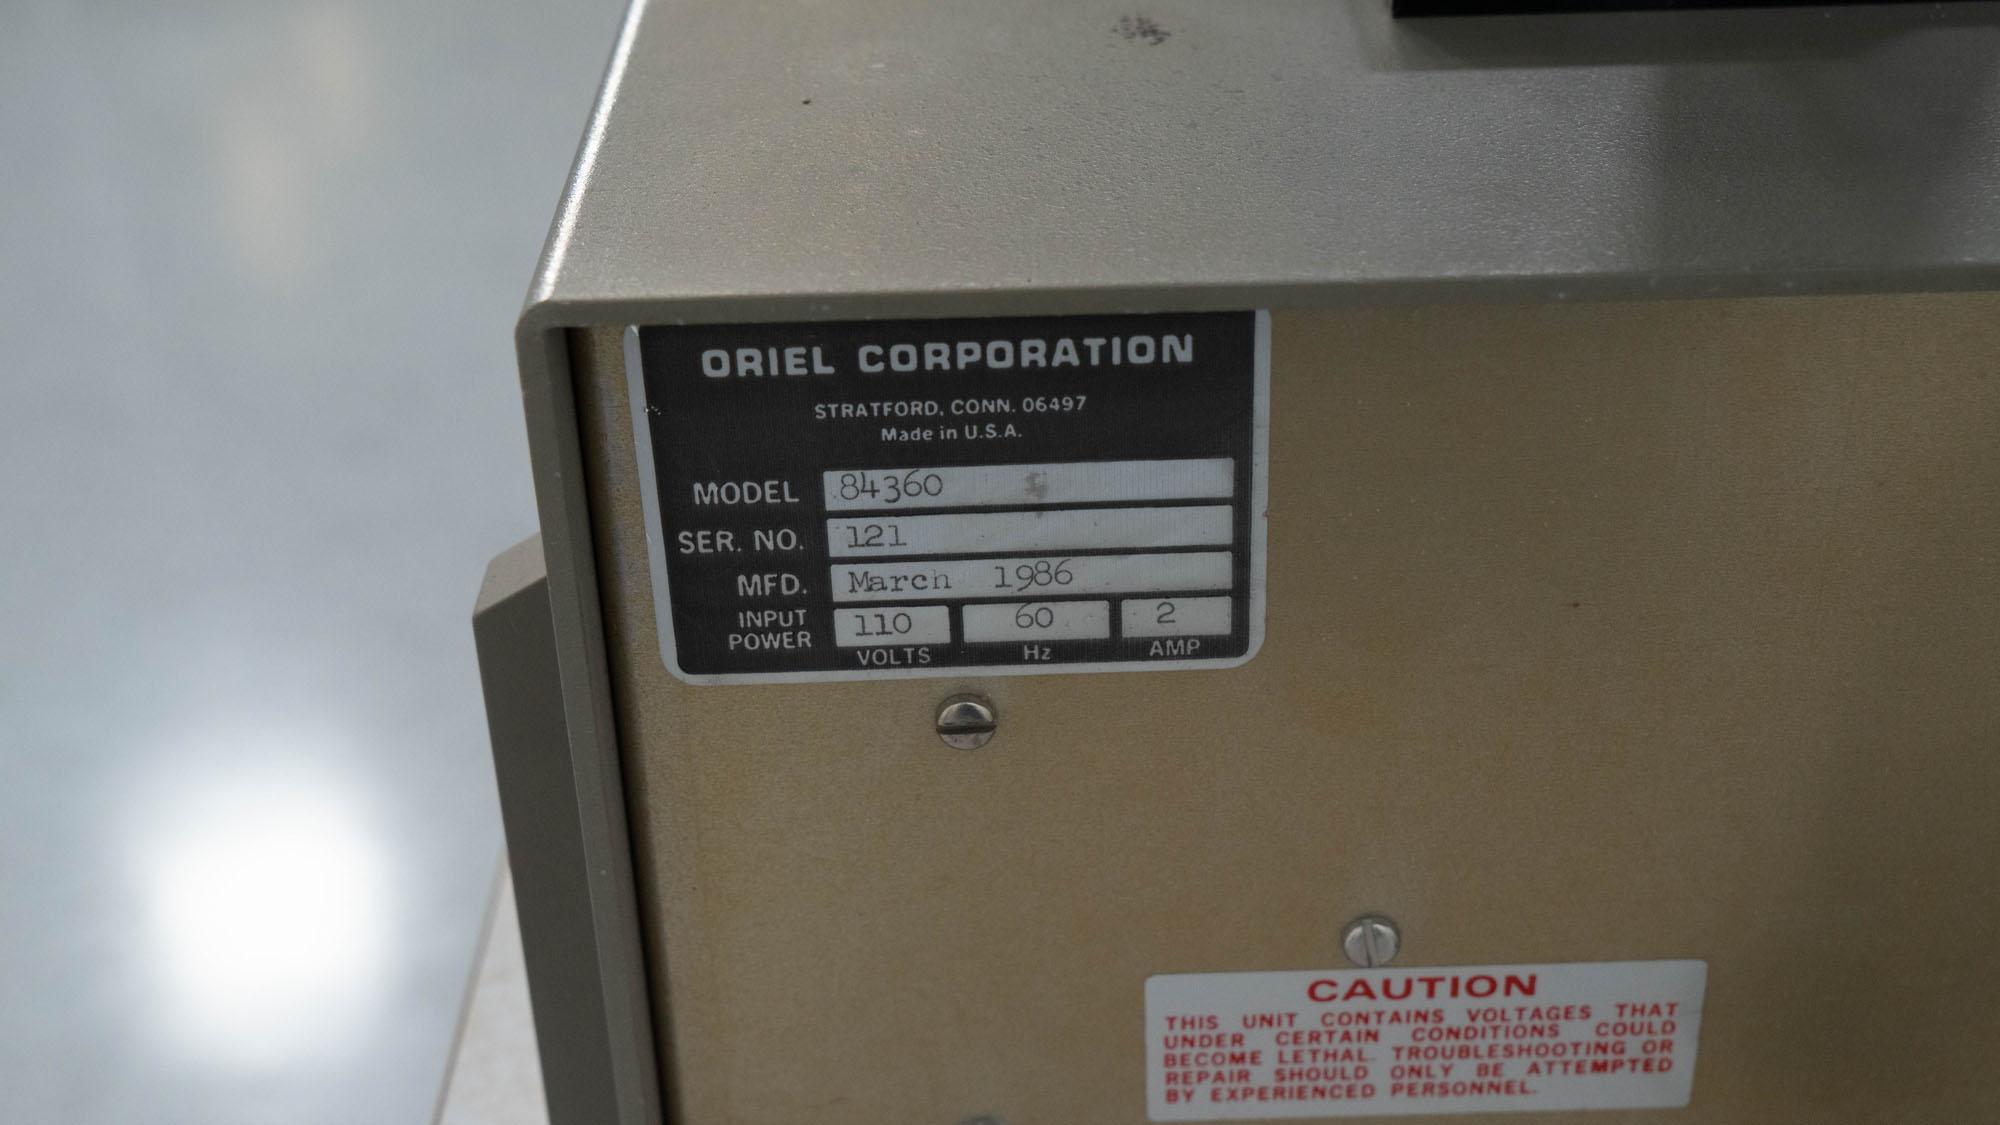 Oriel Exposure System